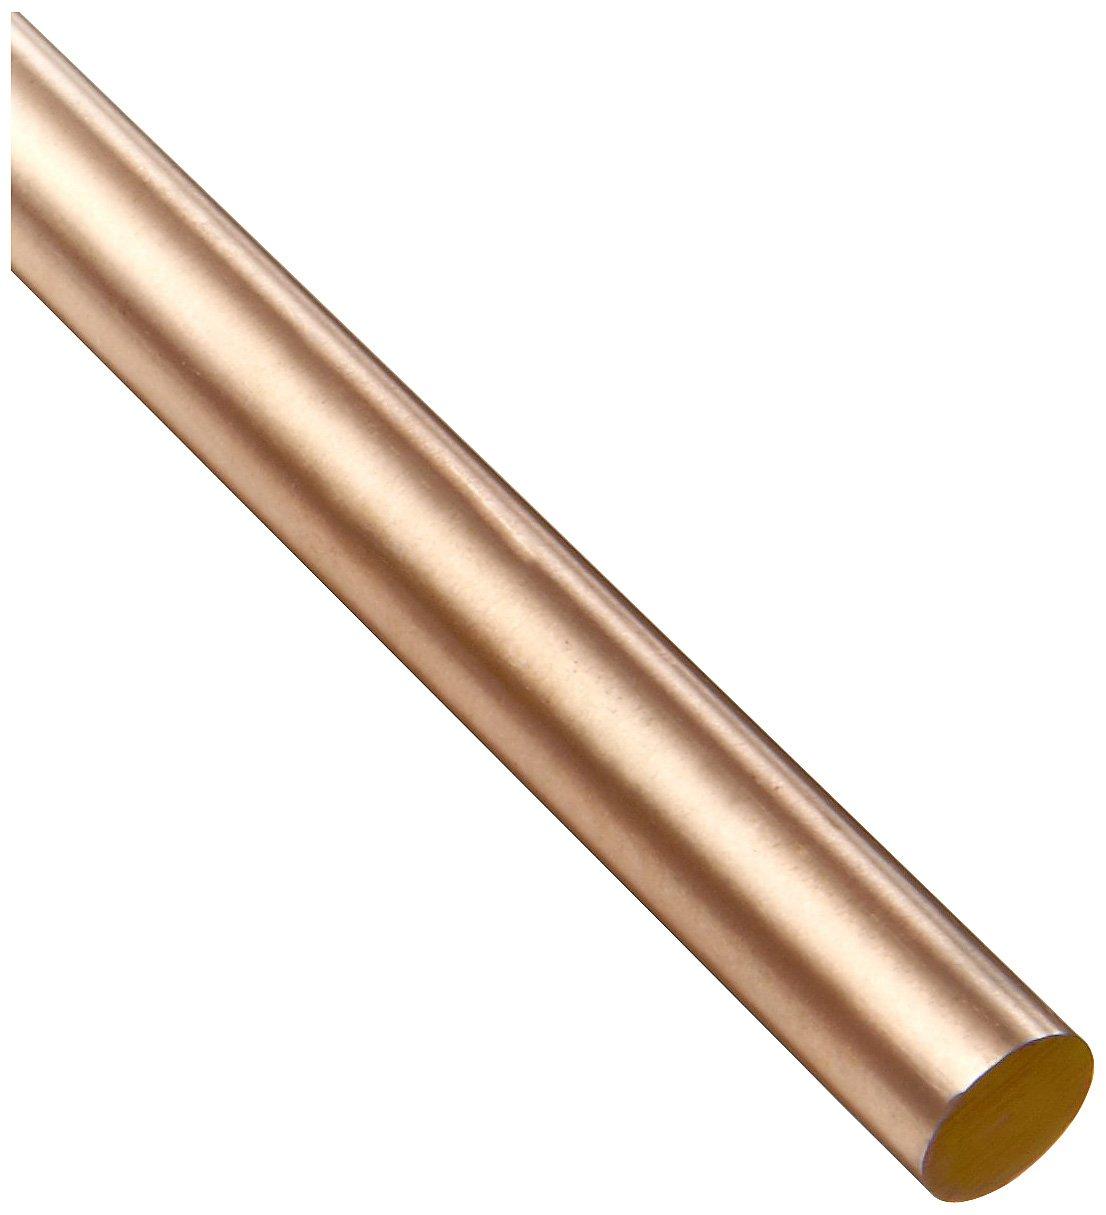 36 Length 145 Copper Round Rod Mill Finish ASTM B301 Unpolished H02 Temper 0.25 Diameter